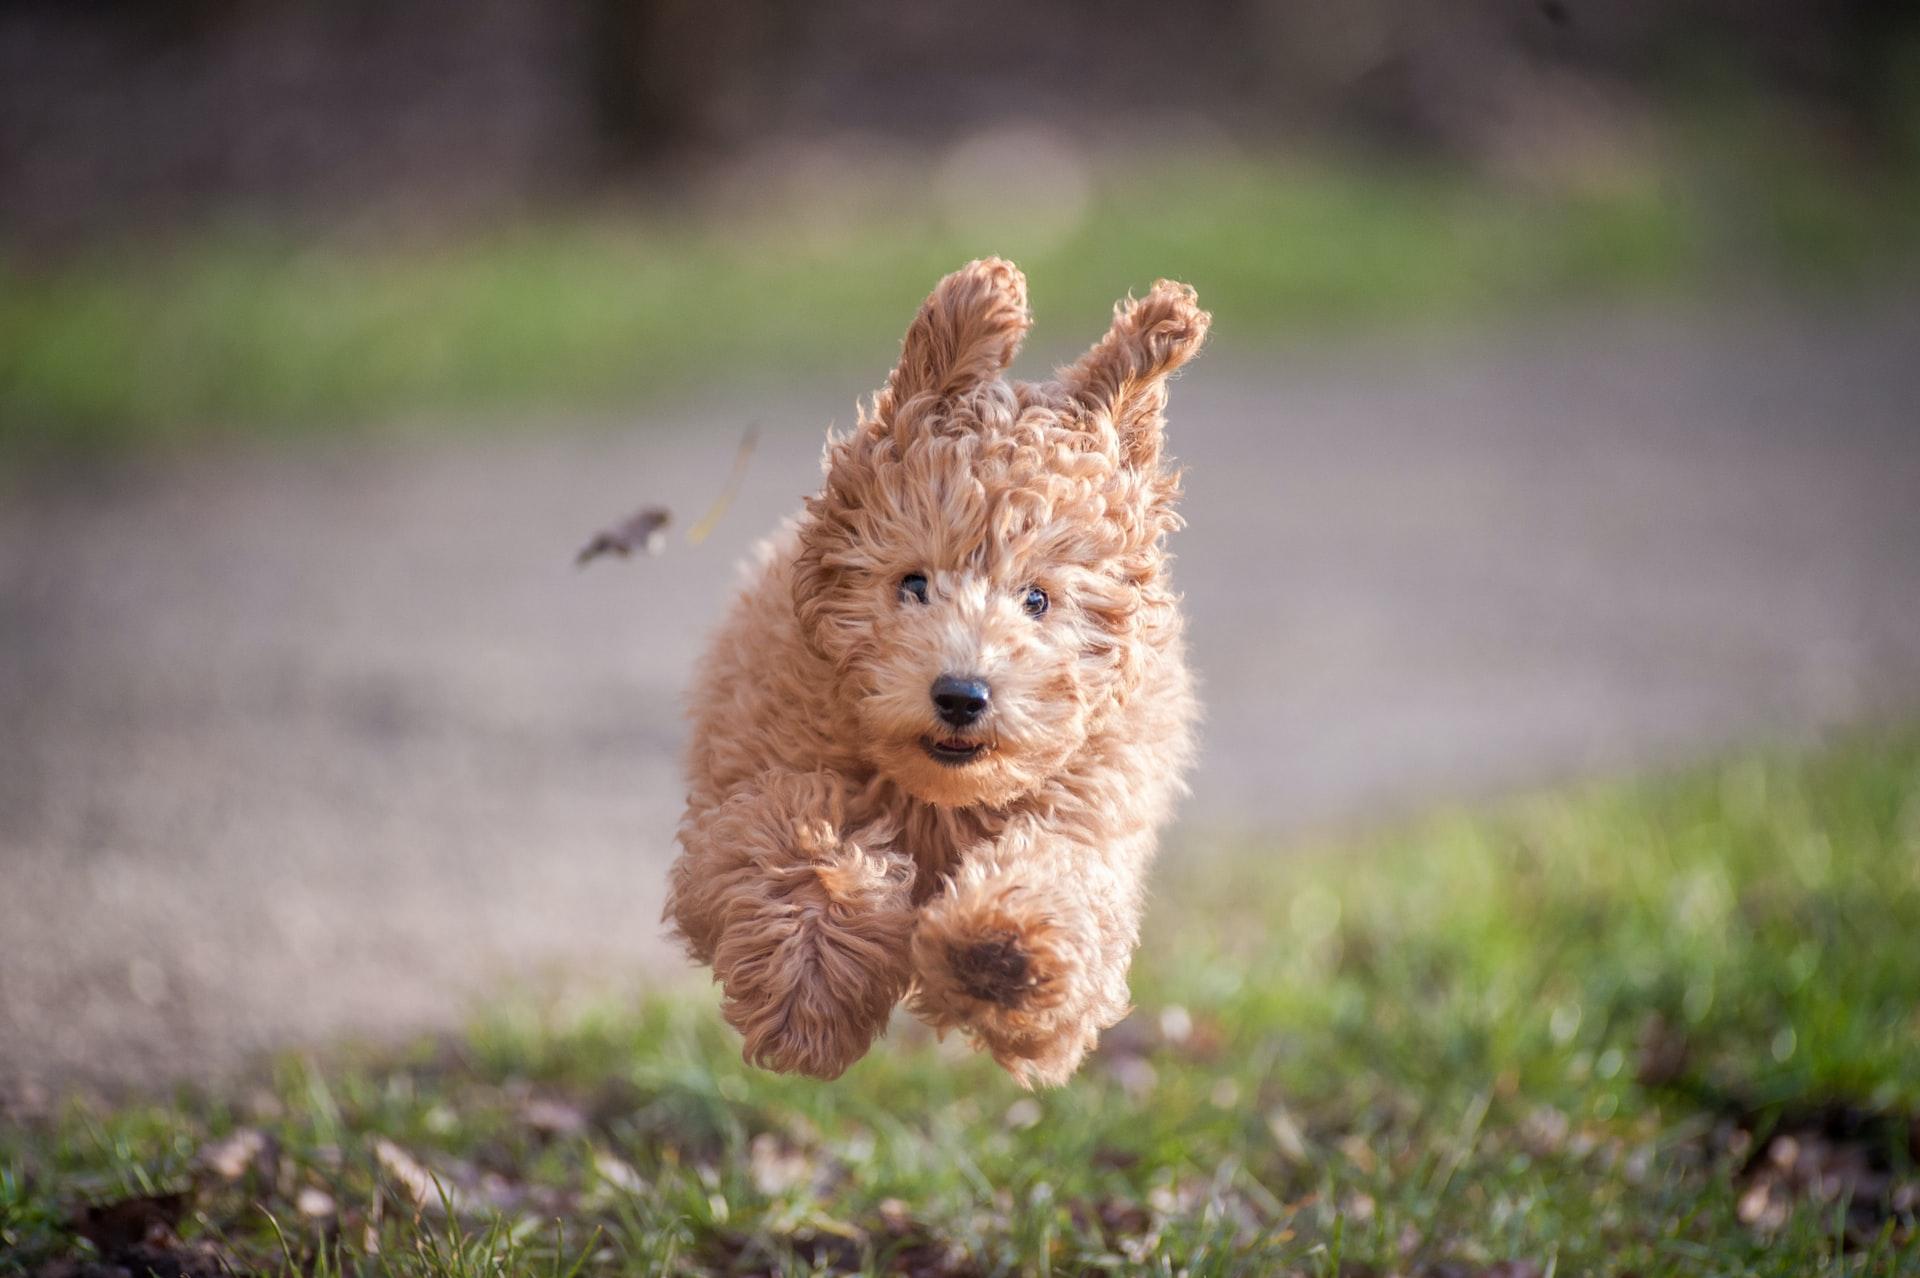 Cachorro poodle toy